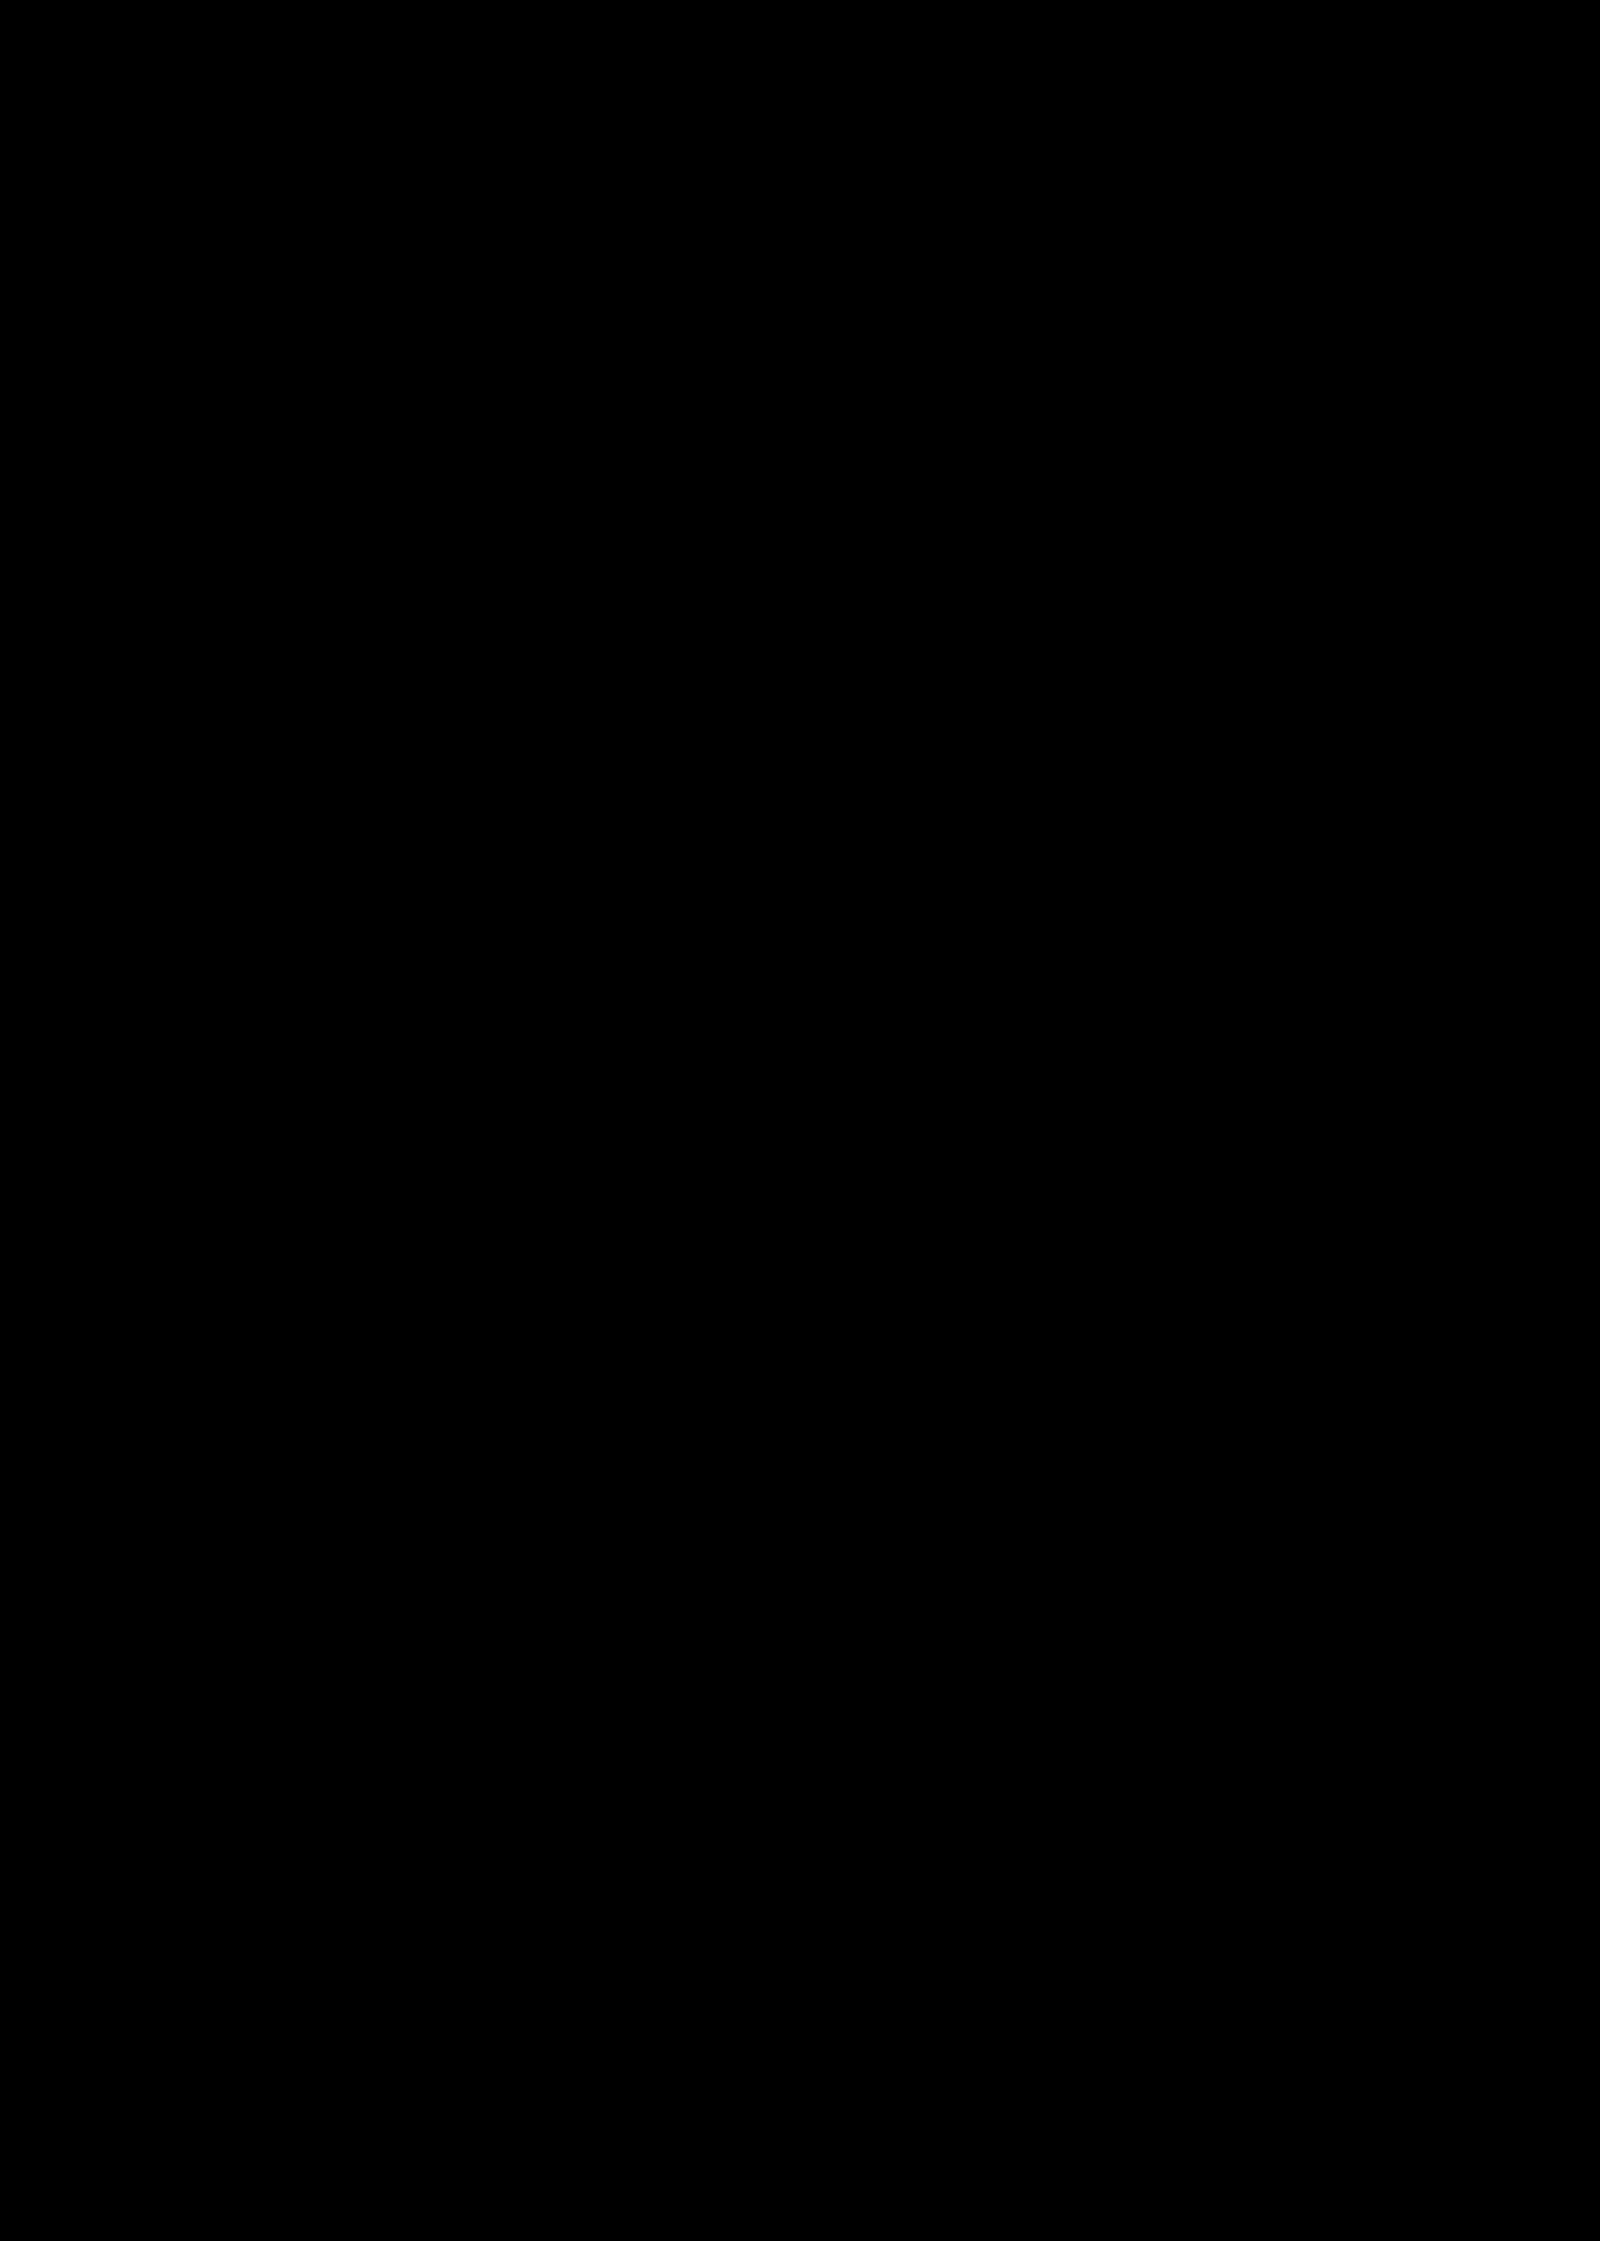 Goku Ssj End of Z by Andrewdb28 on DeviantArt  Dragon ball super